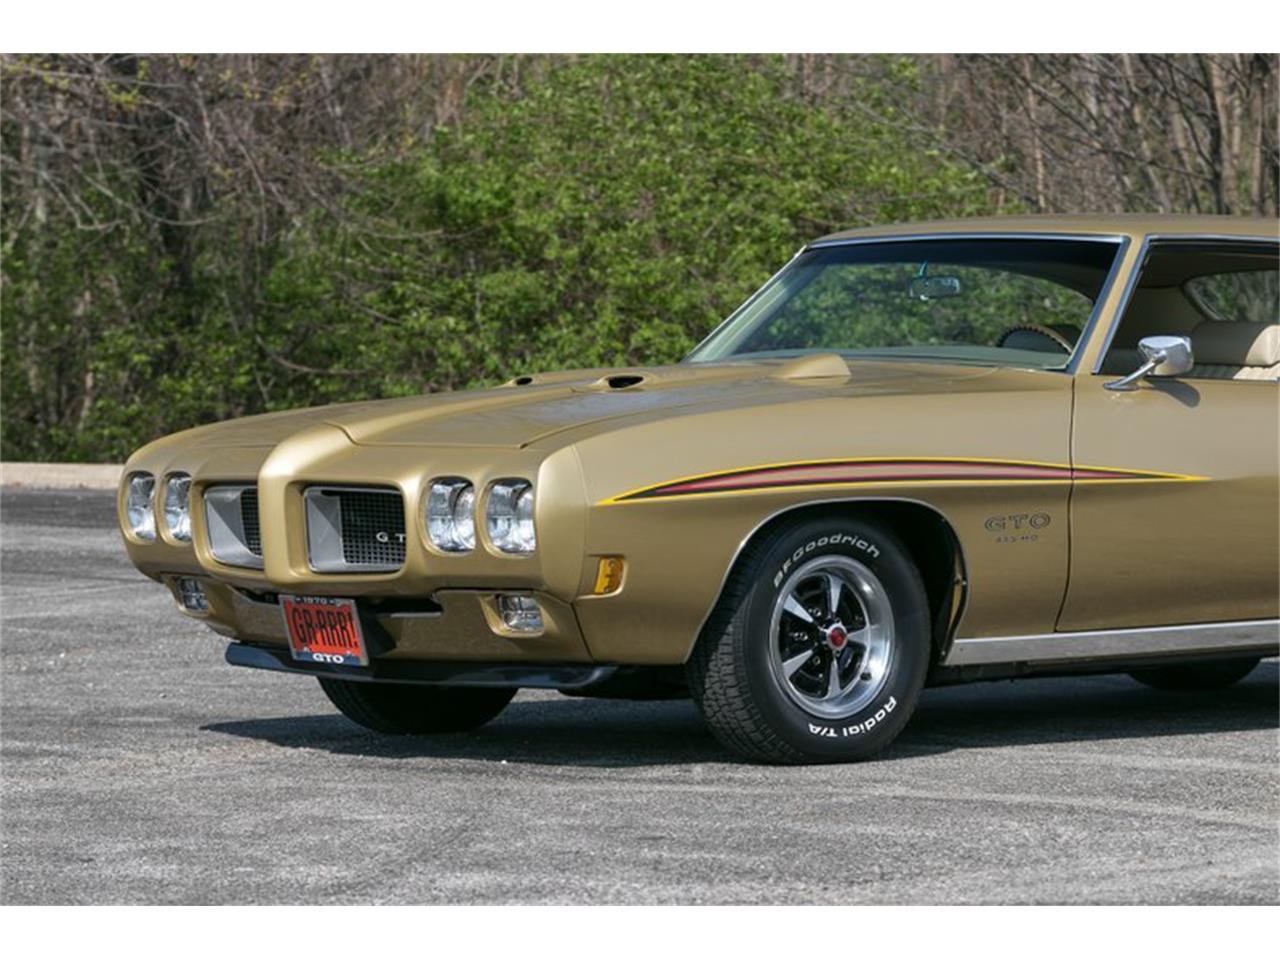 Large Picture of '70 Pontiac GTO - $59,995.00 - QKPX